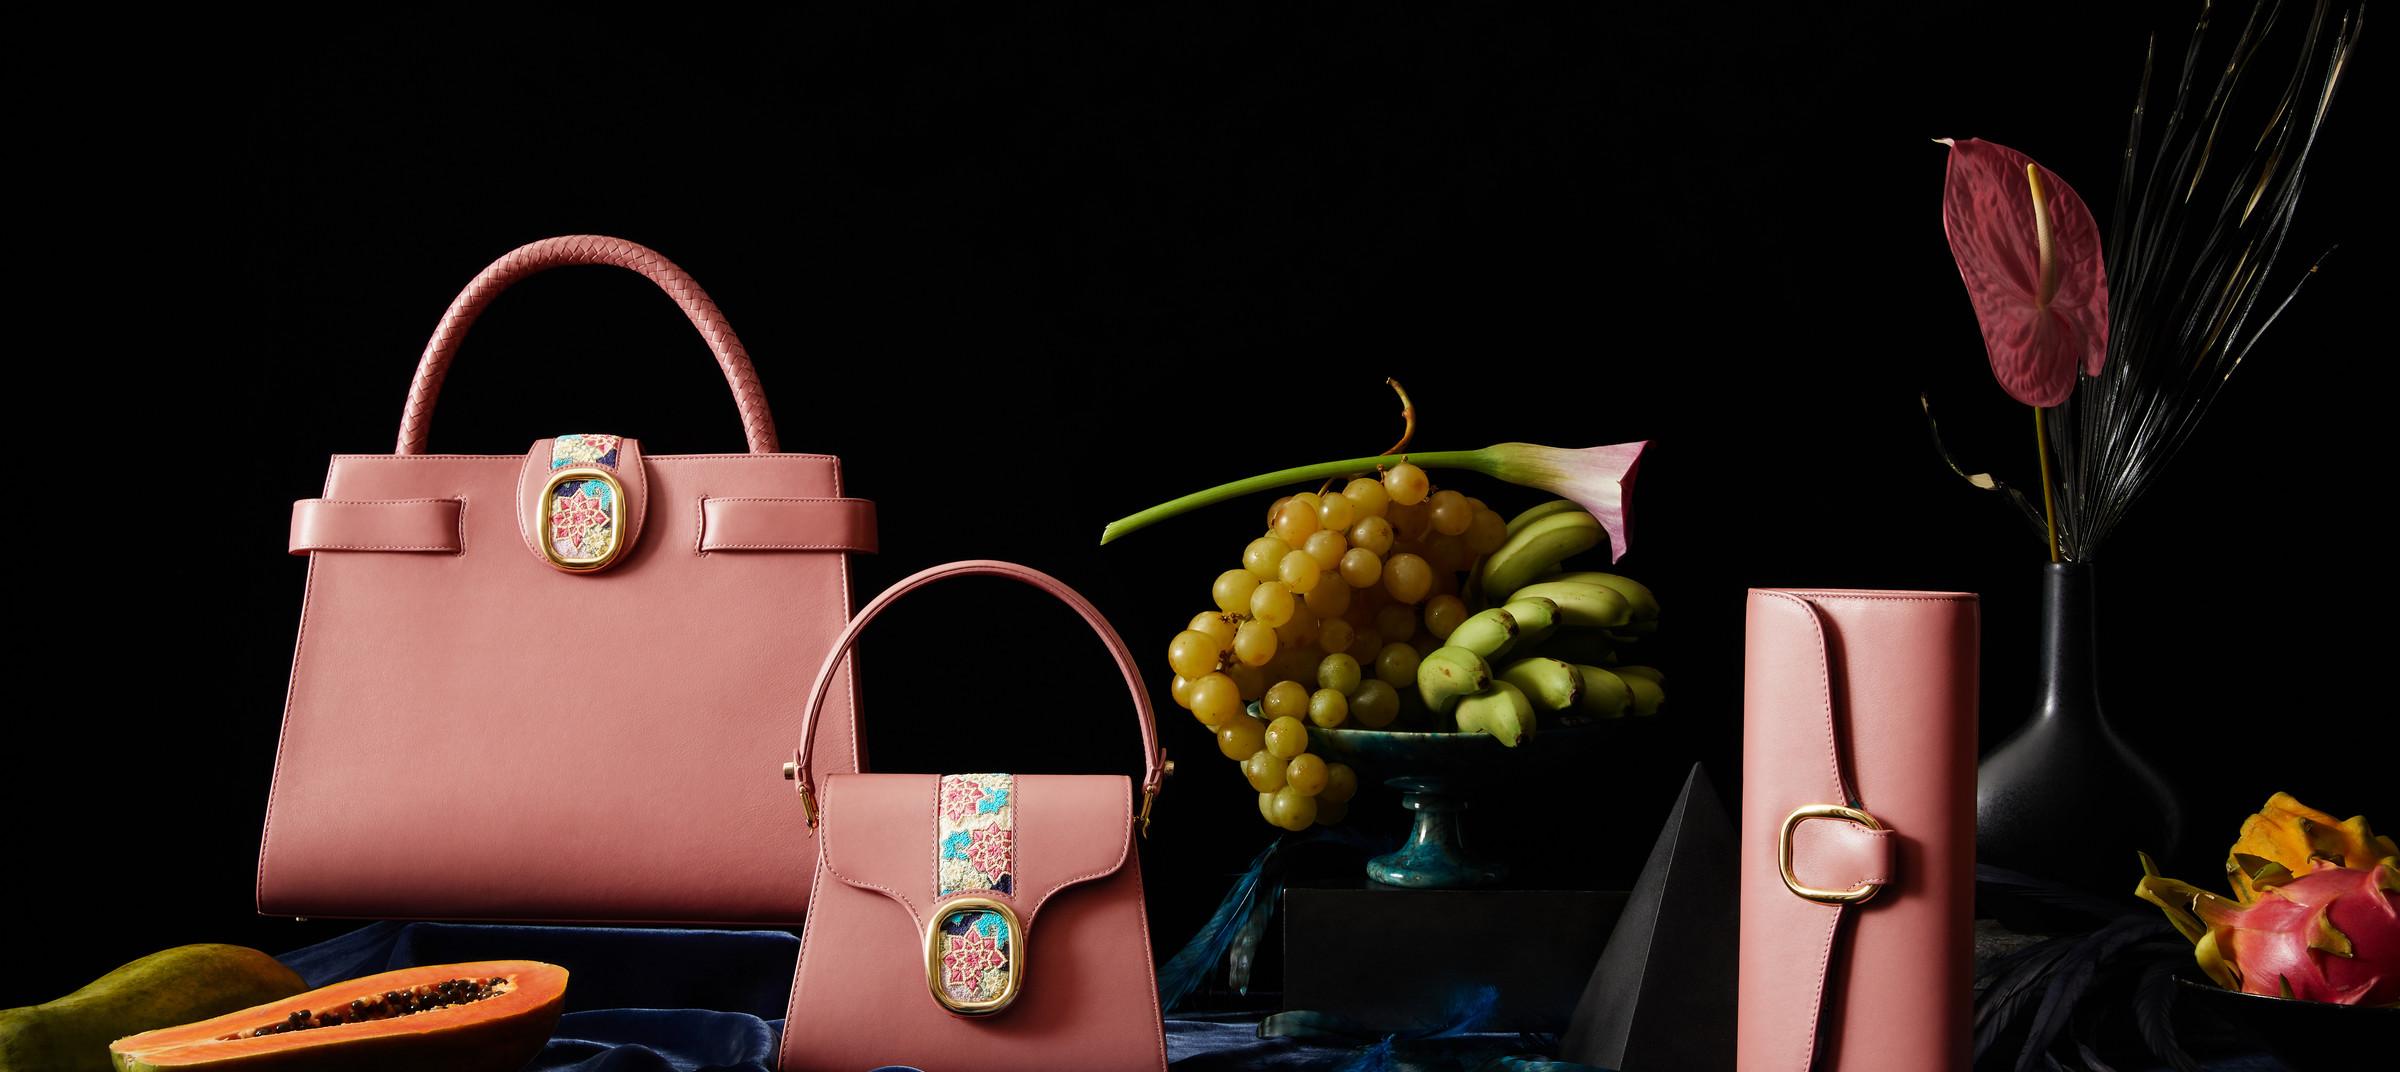 Luxury handbags captured by DTE in their in-house studio.